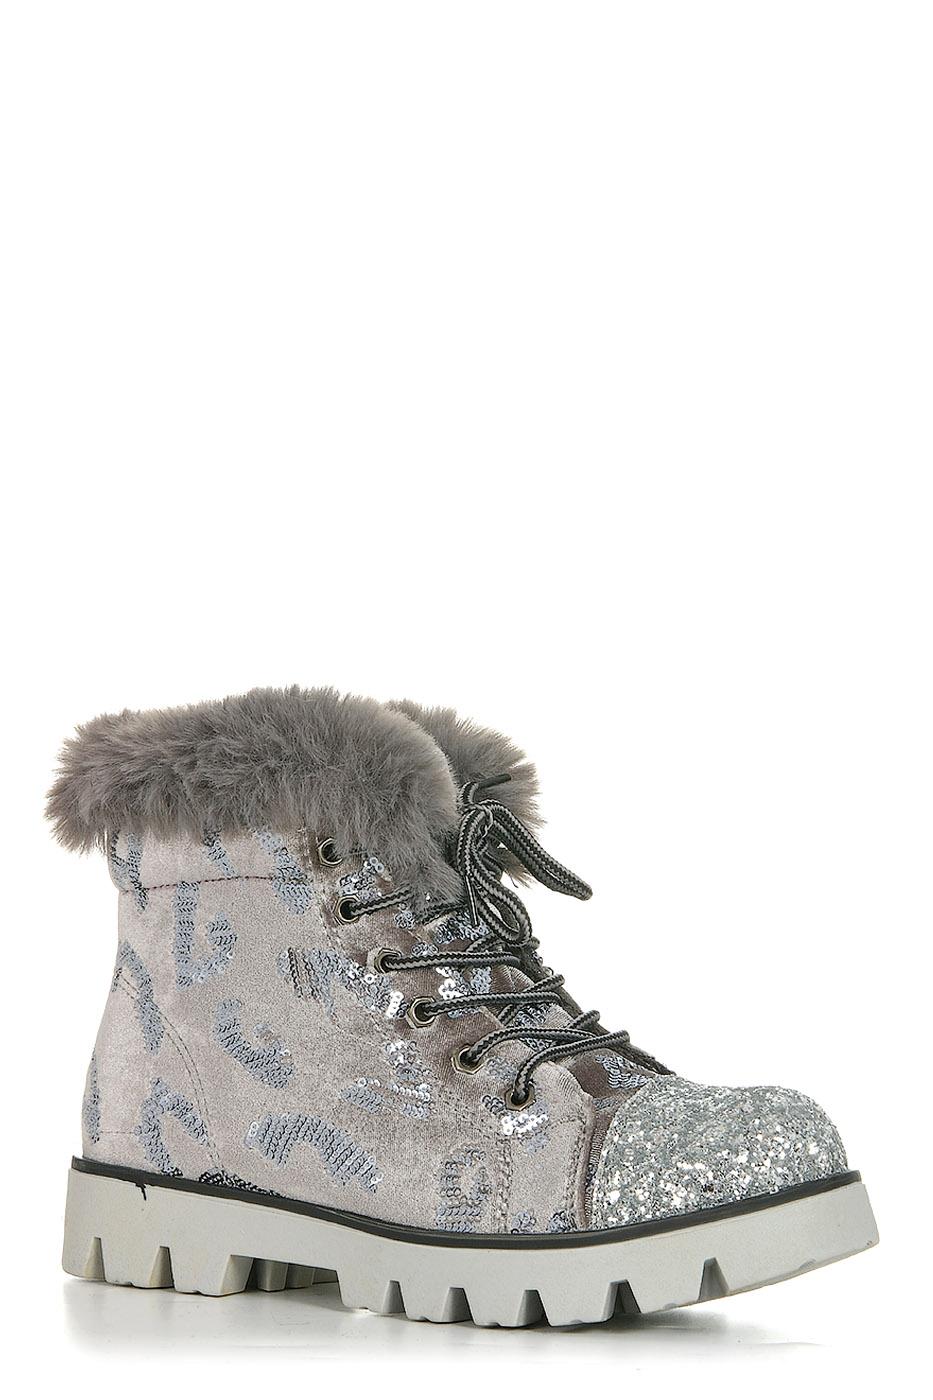 Ботинки TOPLAND2353-PB76208C/GREY